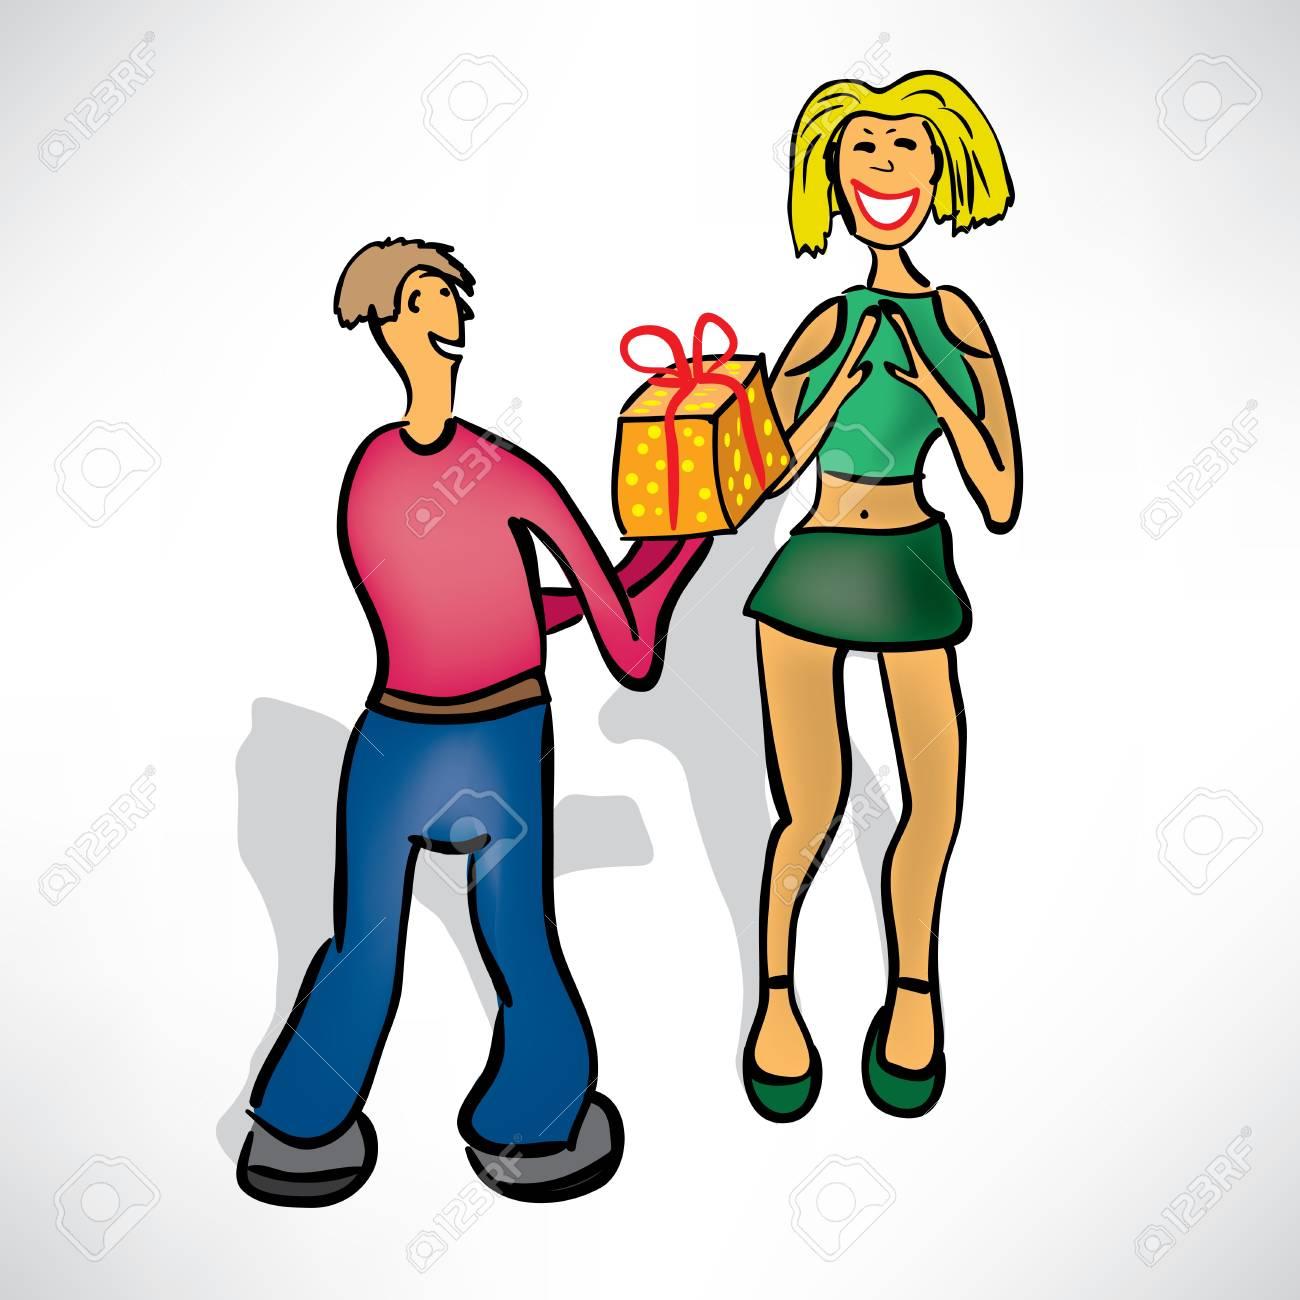 Man gives girl a gift Stock Vector - 12982779